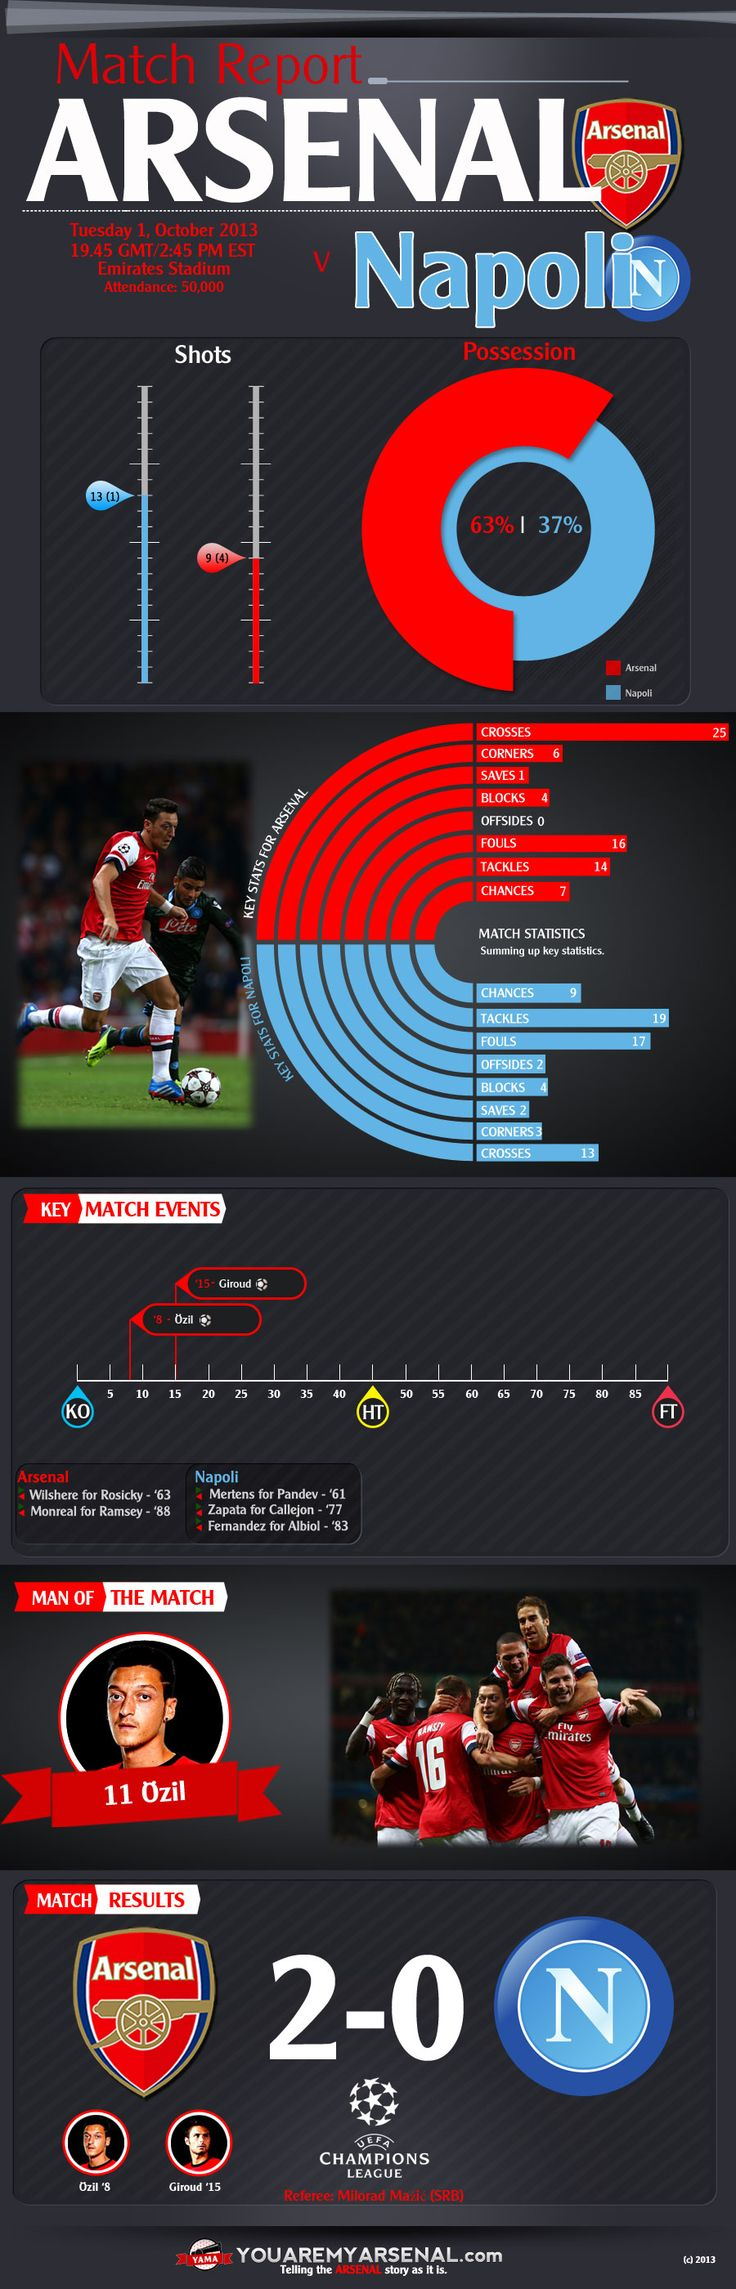 Arsenal v Napoli infographic - key moments and stats